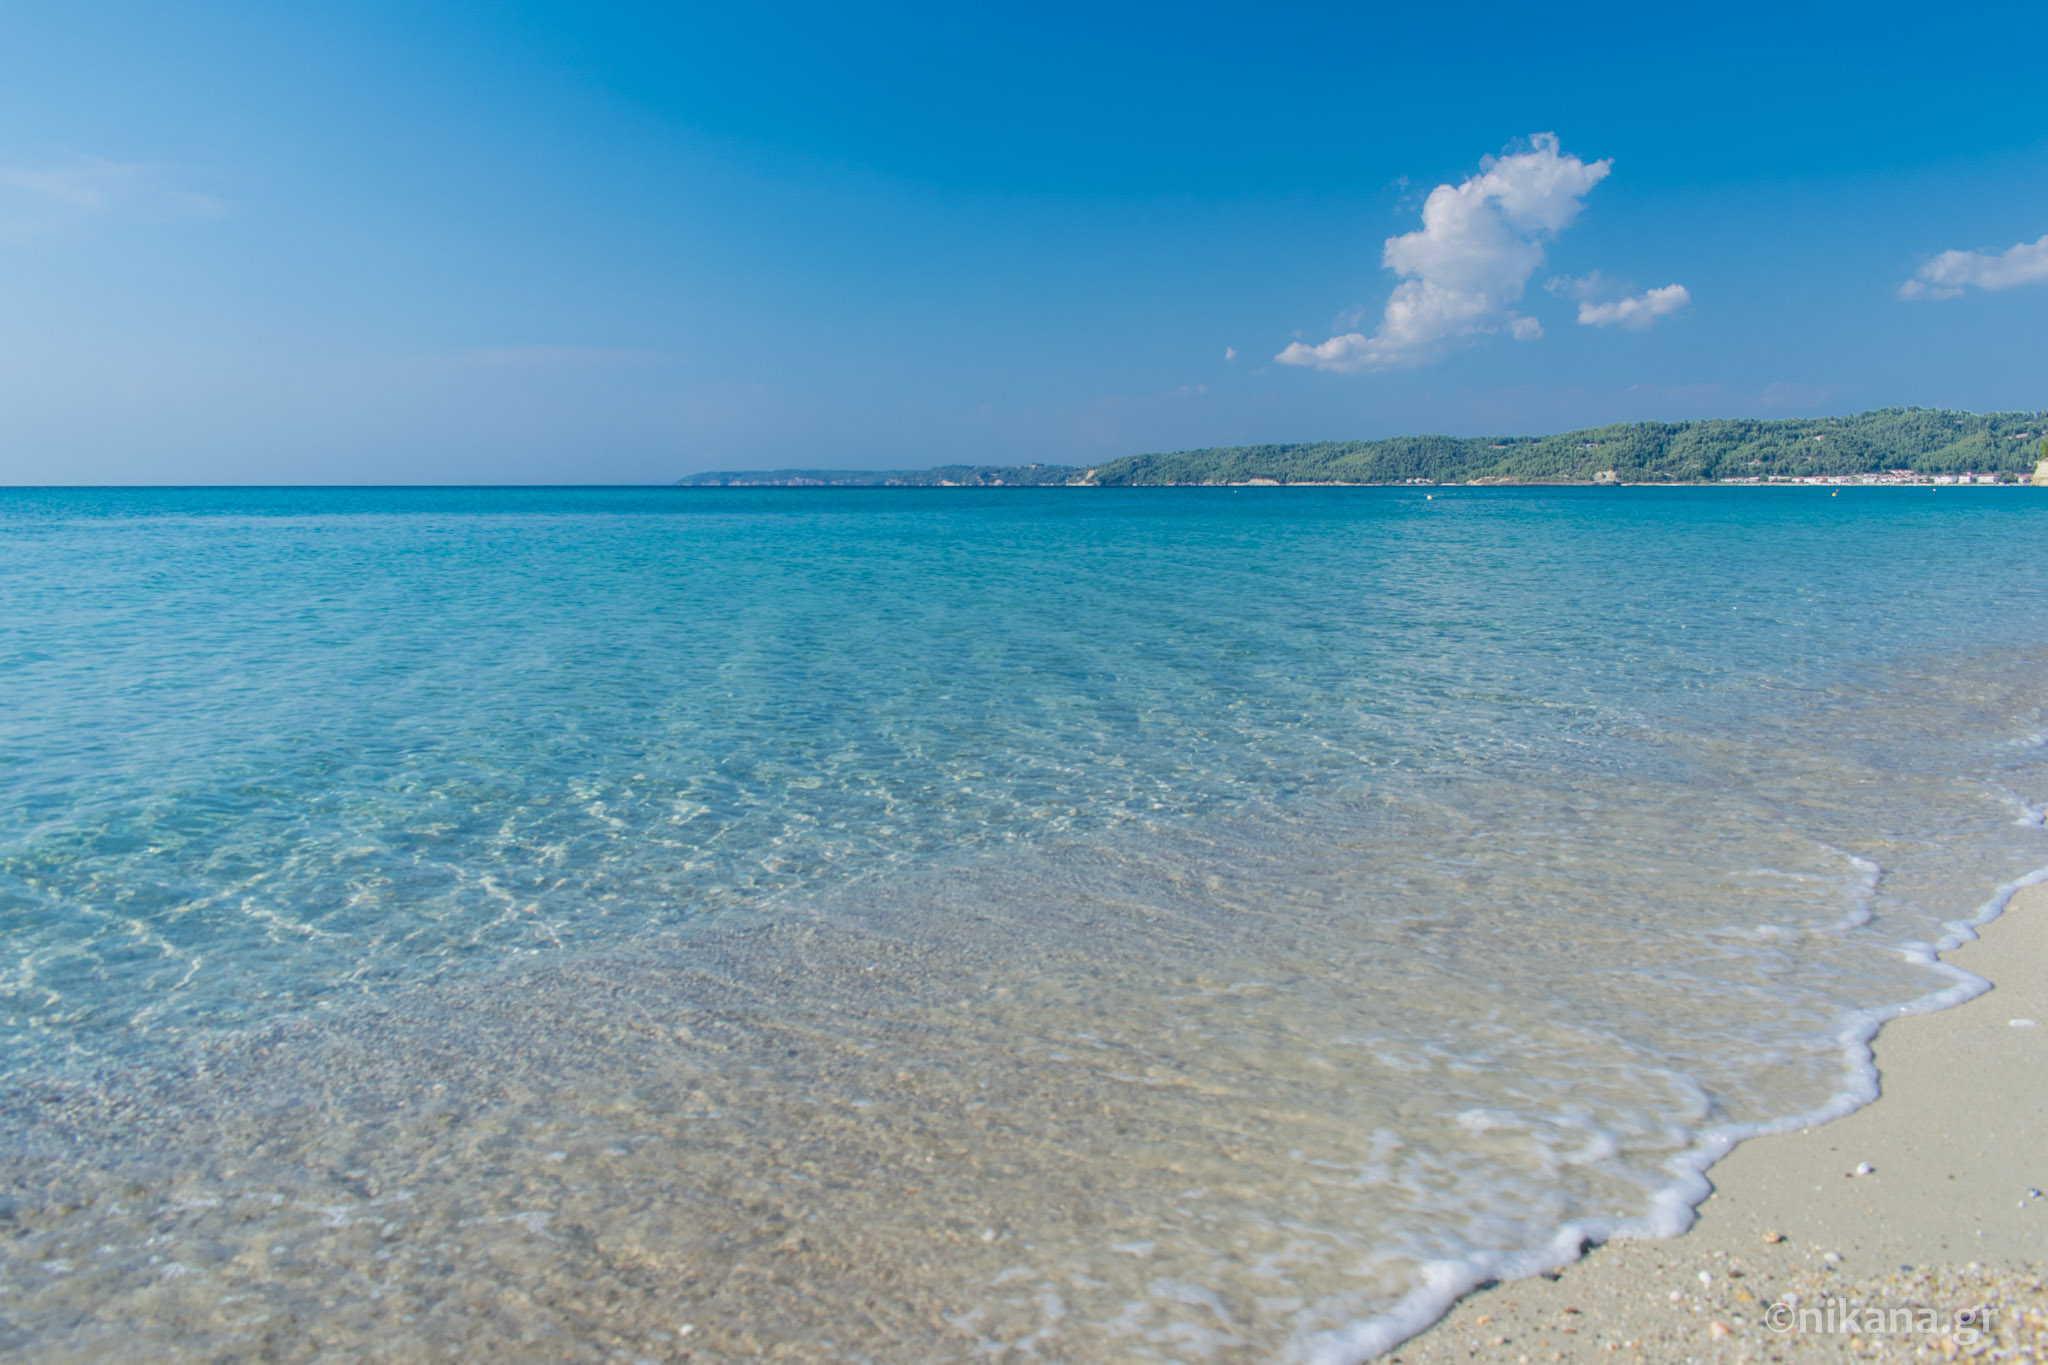 Aigeopelagitika beach - Kassandra tourist guide - Nikana.gr